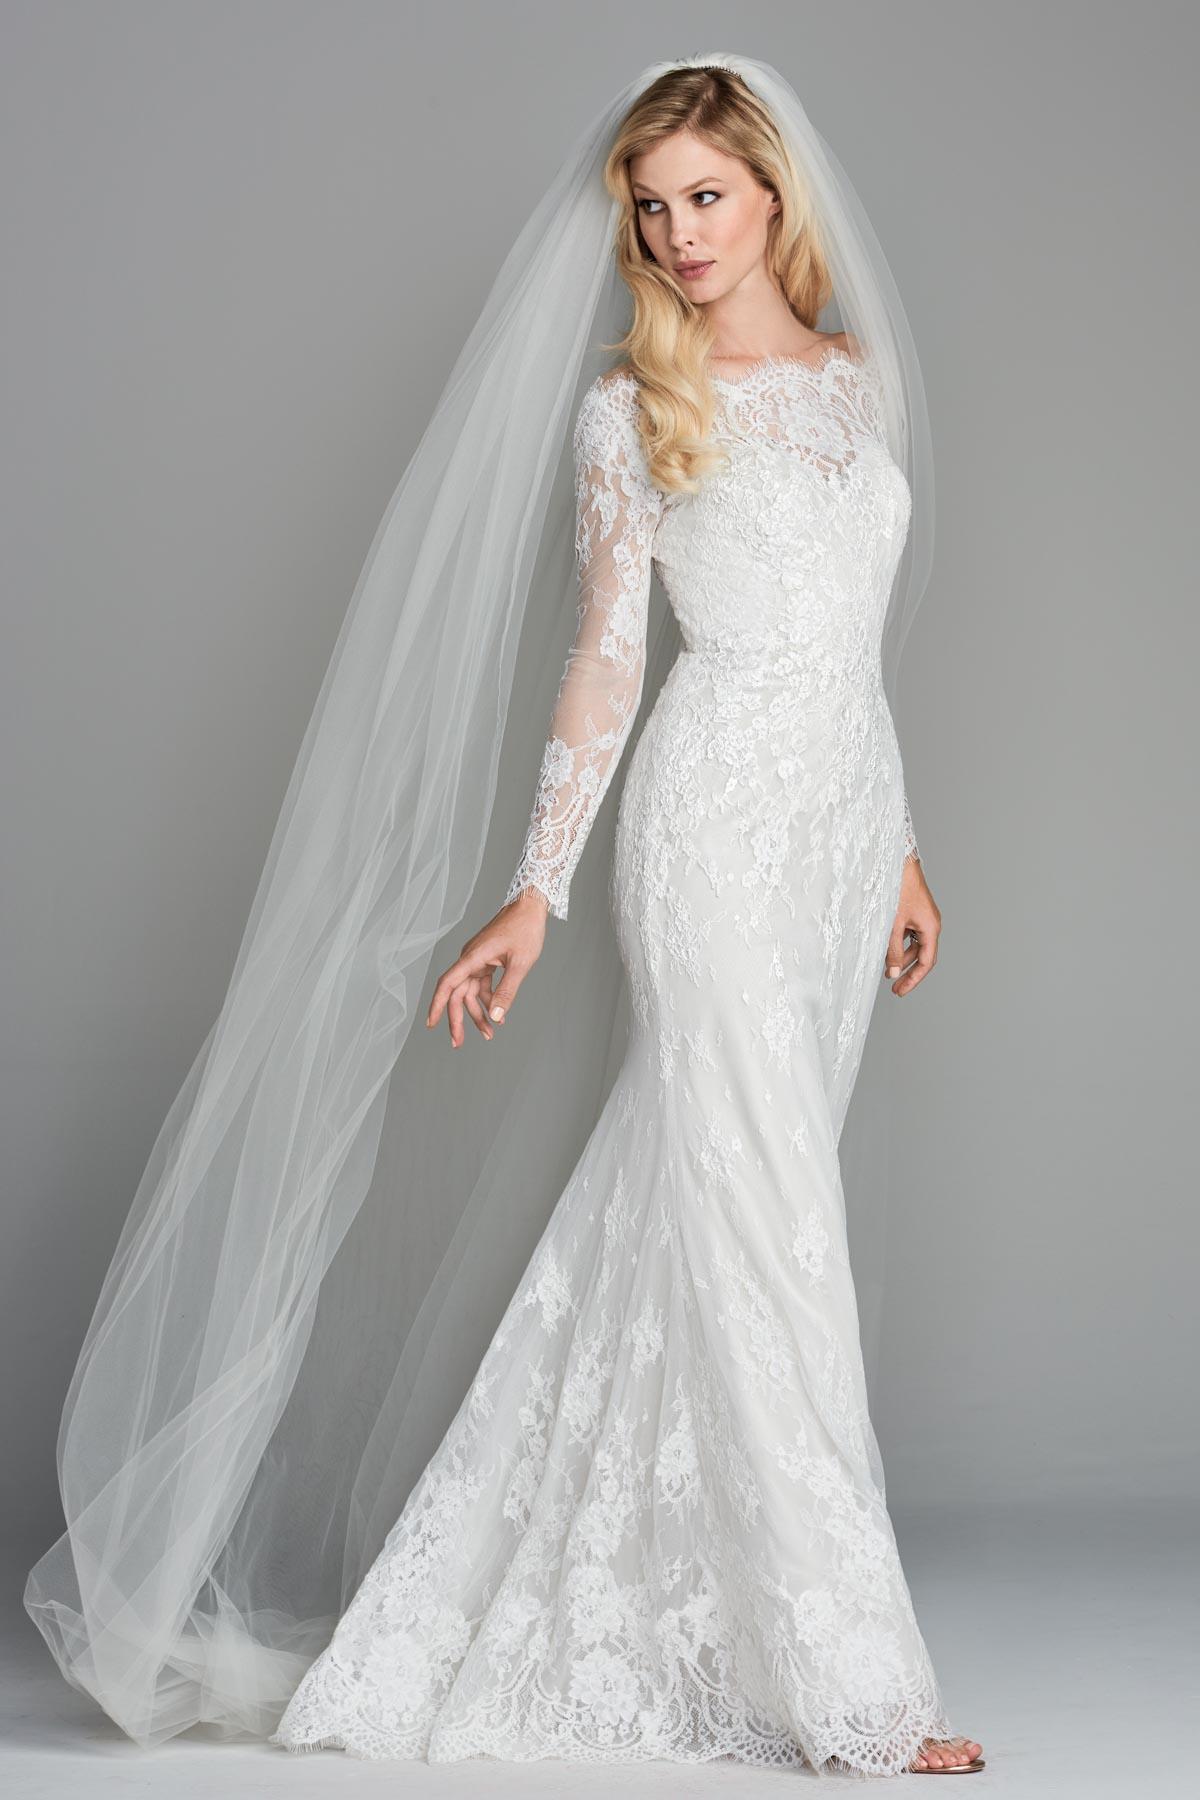 Scoop neck long sleeved sheath wedding dress bycouturier scoop neck long sleeved sheath wedding dress junglespirit Image collections